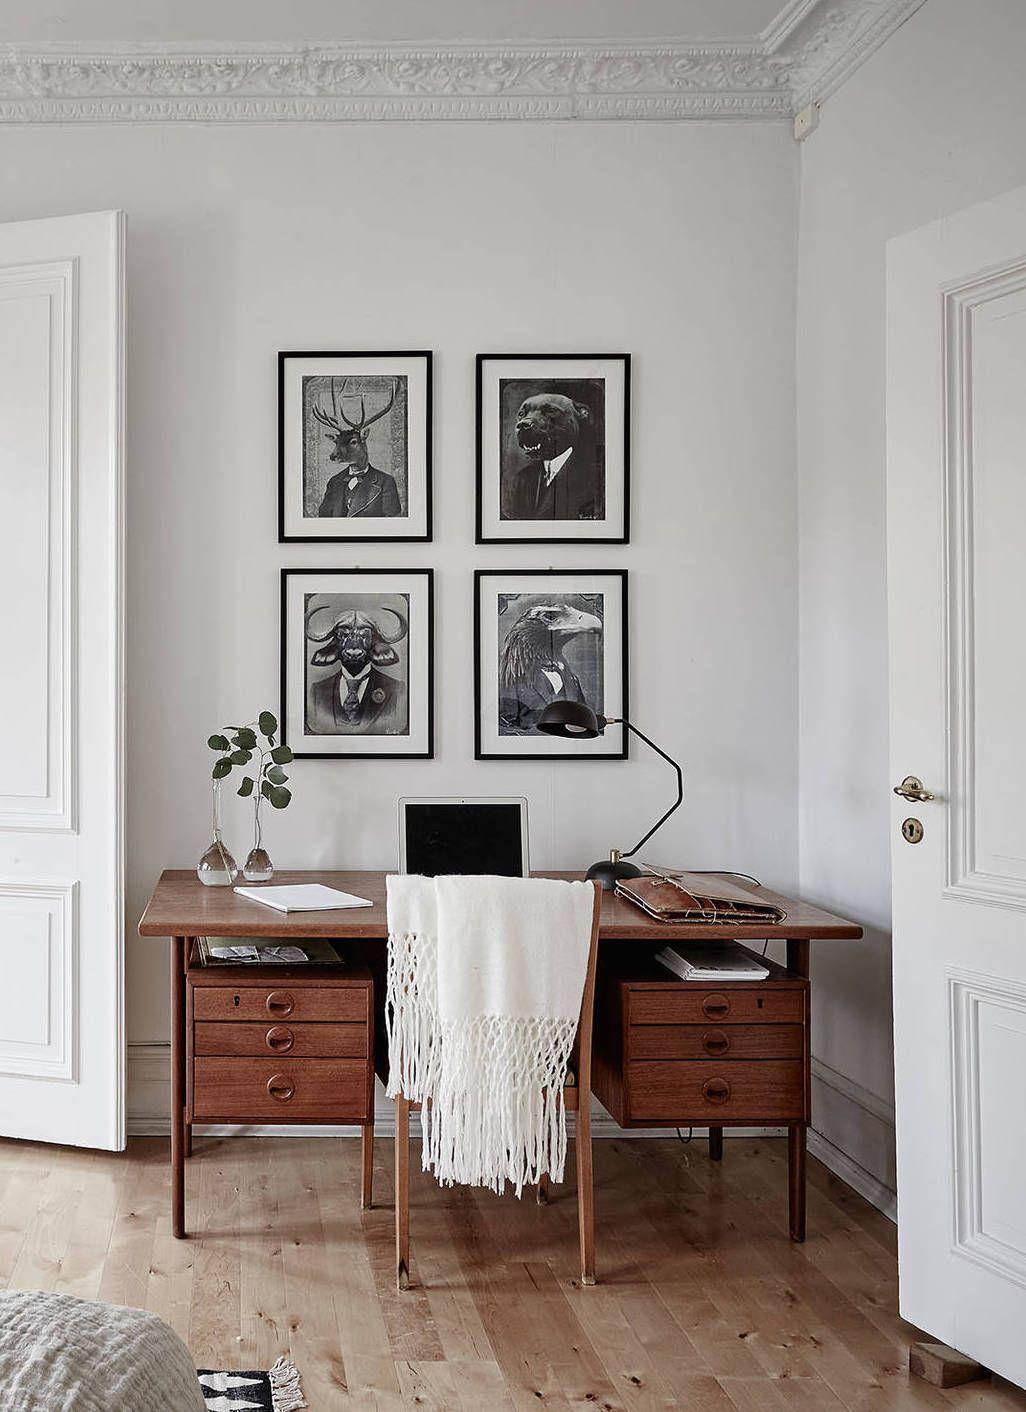 Midcentury modern interior in an old building modern interiors